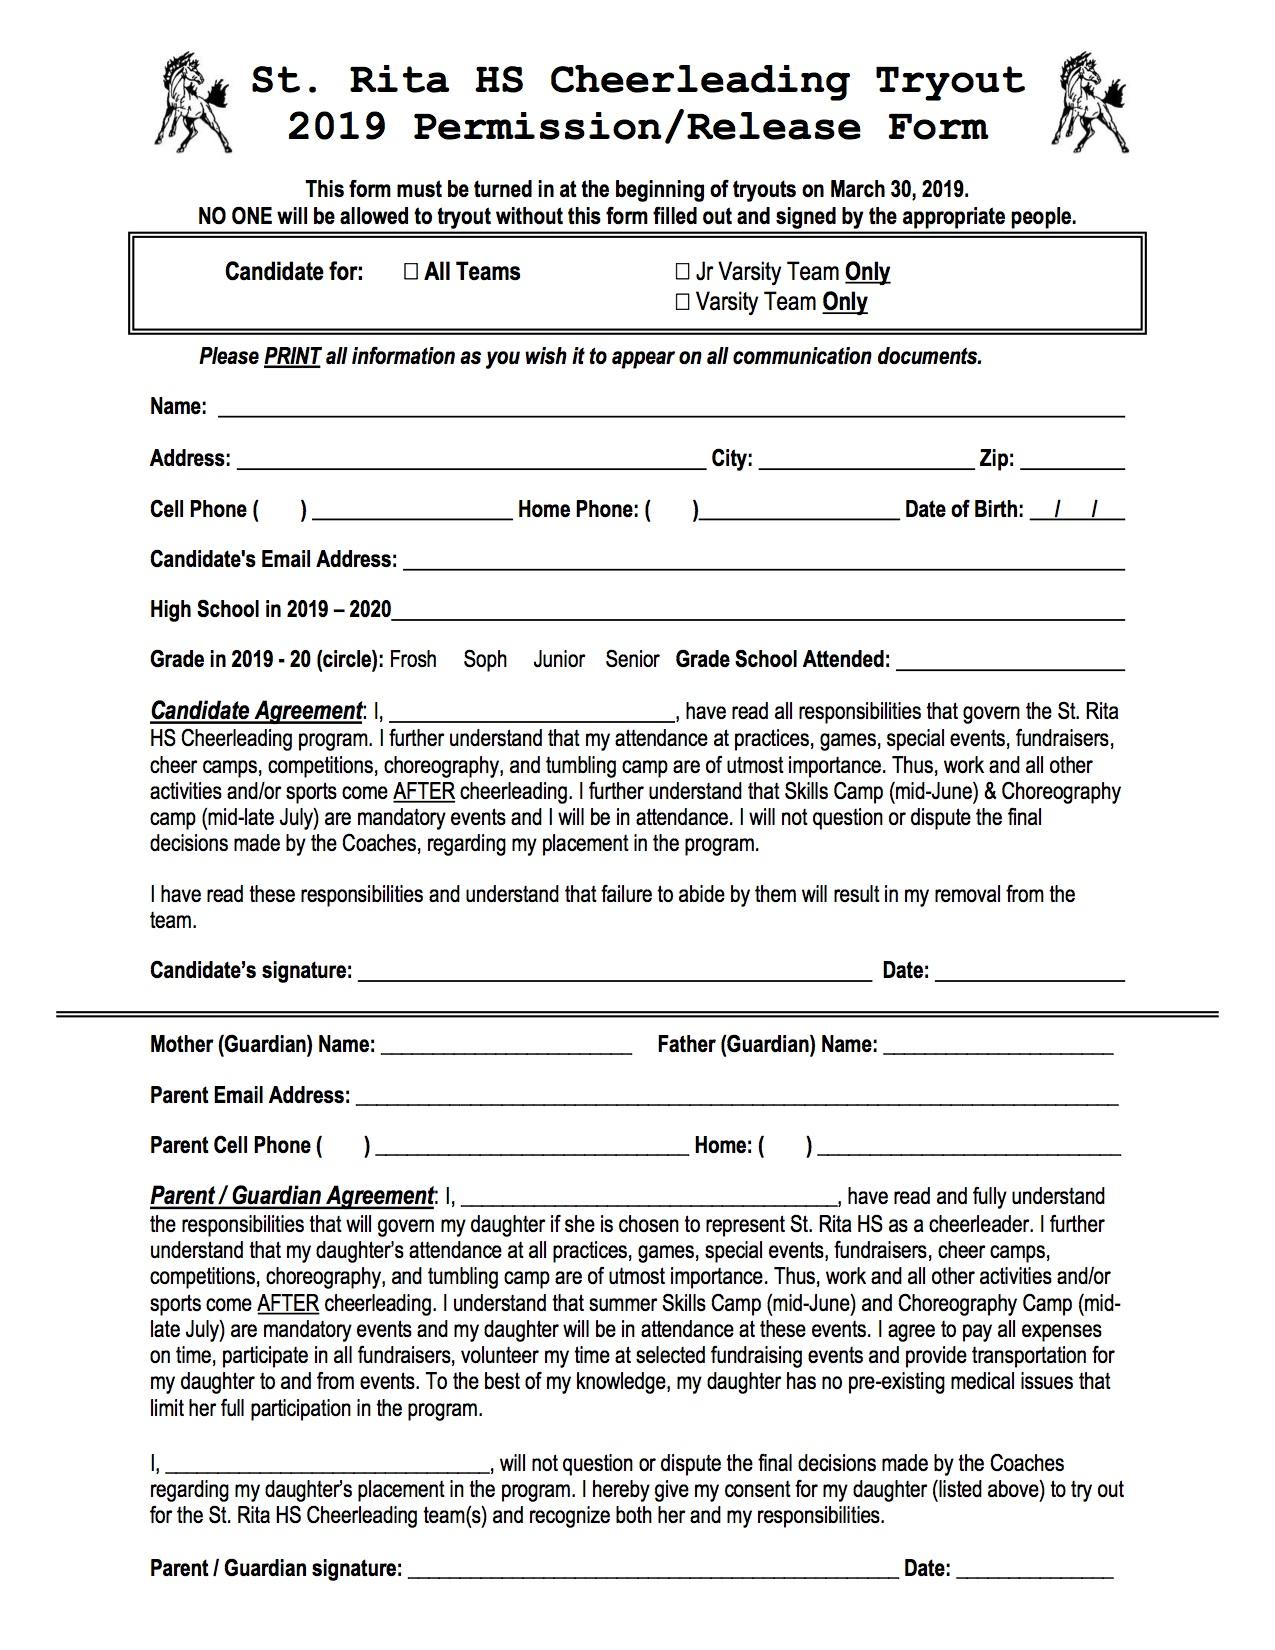 SR Tryout Permission Form_2019 (1).jpg